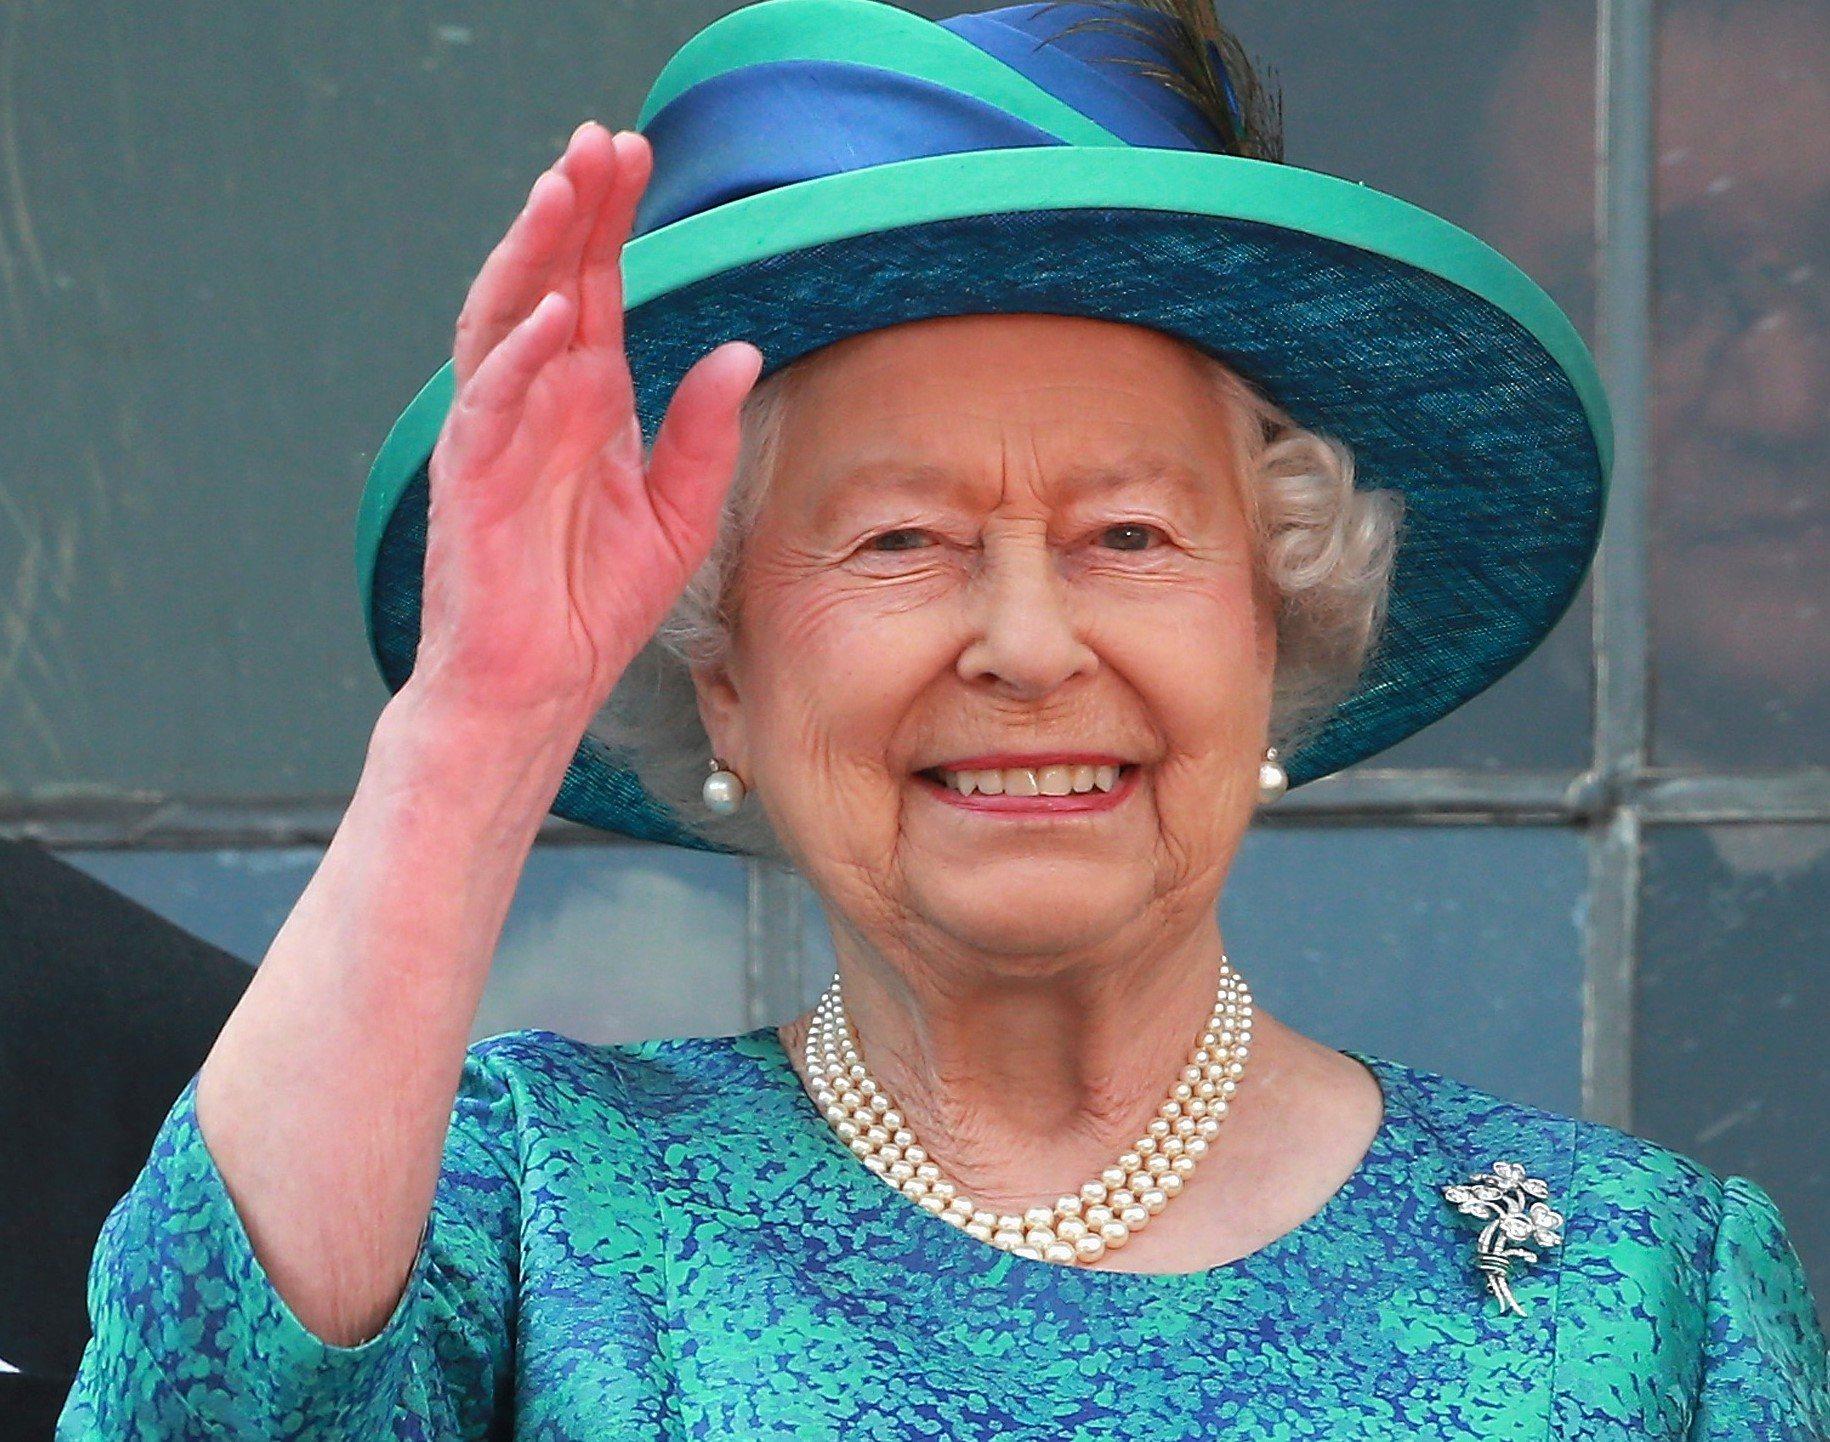 Queen Elizabeth Has Been Wearing This £7.99 Nail Varnish